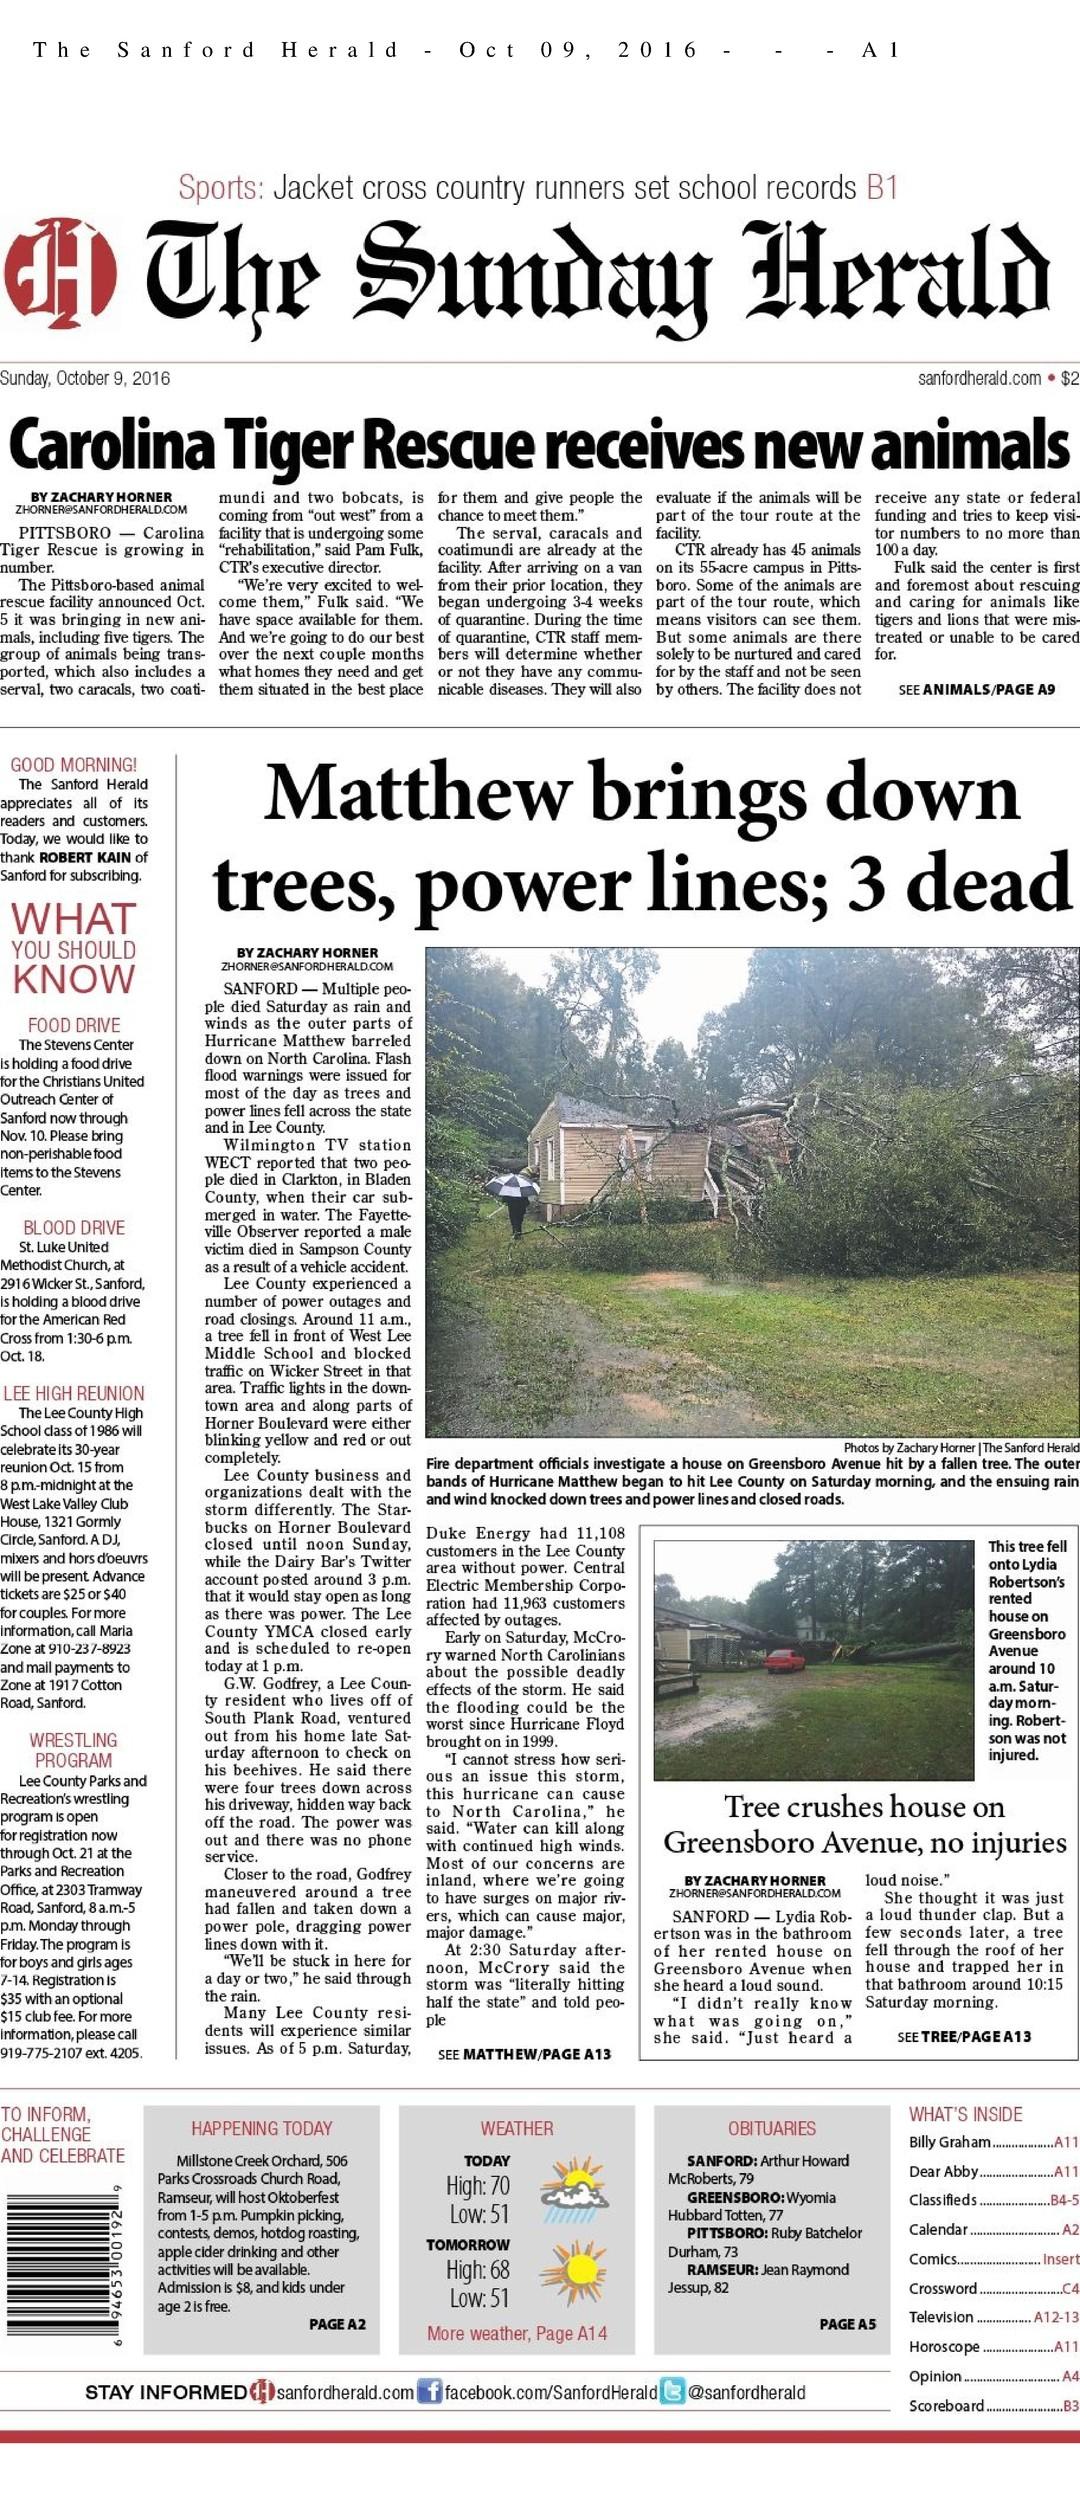 Sanford Herald North Carolina Press Association